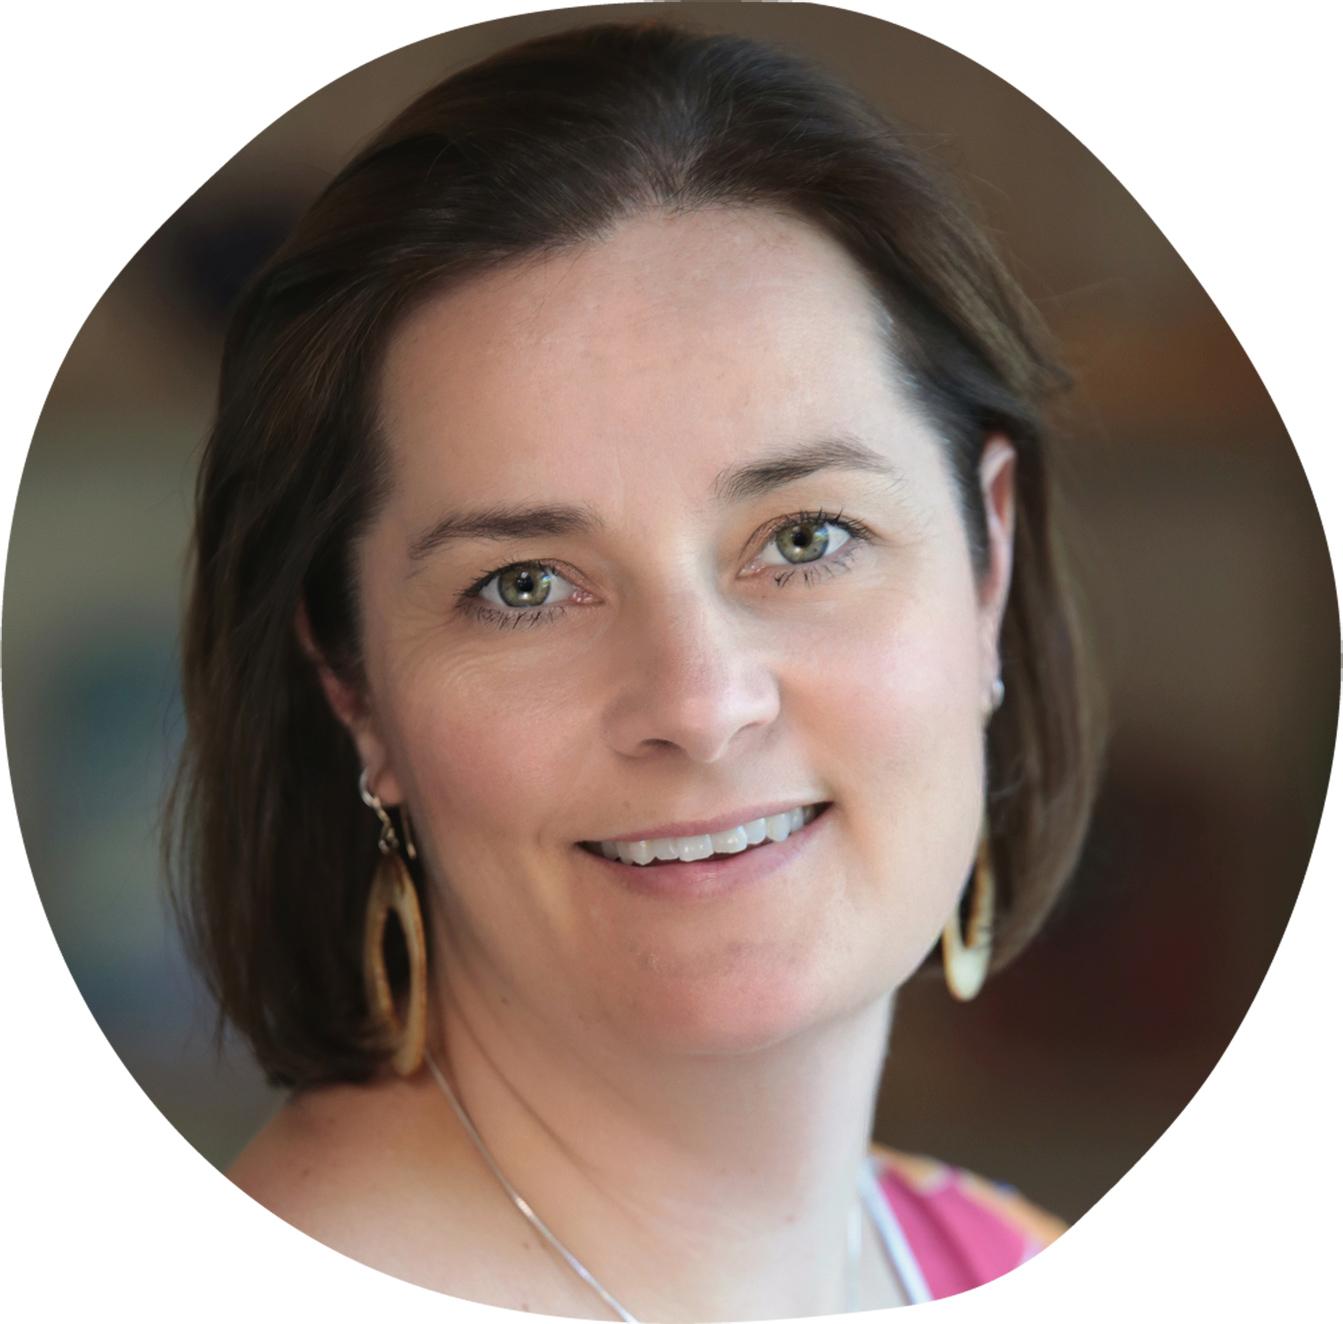 Helen Lentze  Director of Marketing, Redwood Hill Farm and Creamery